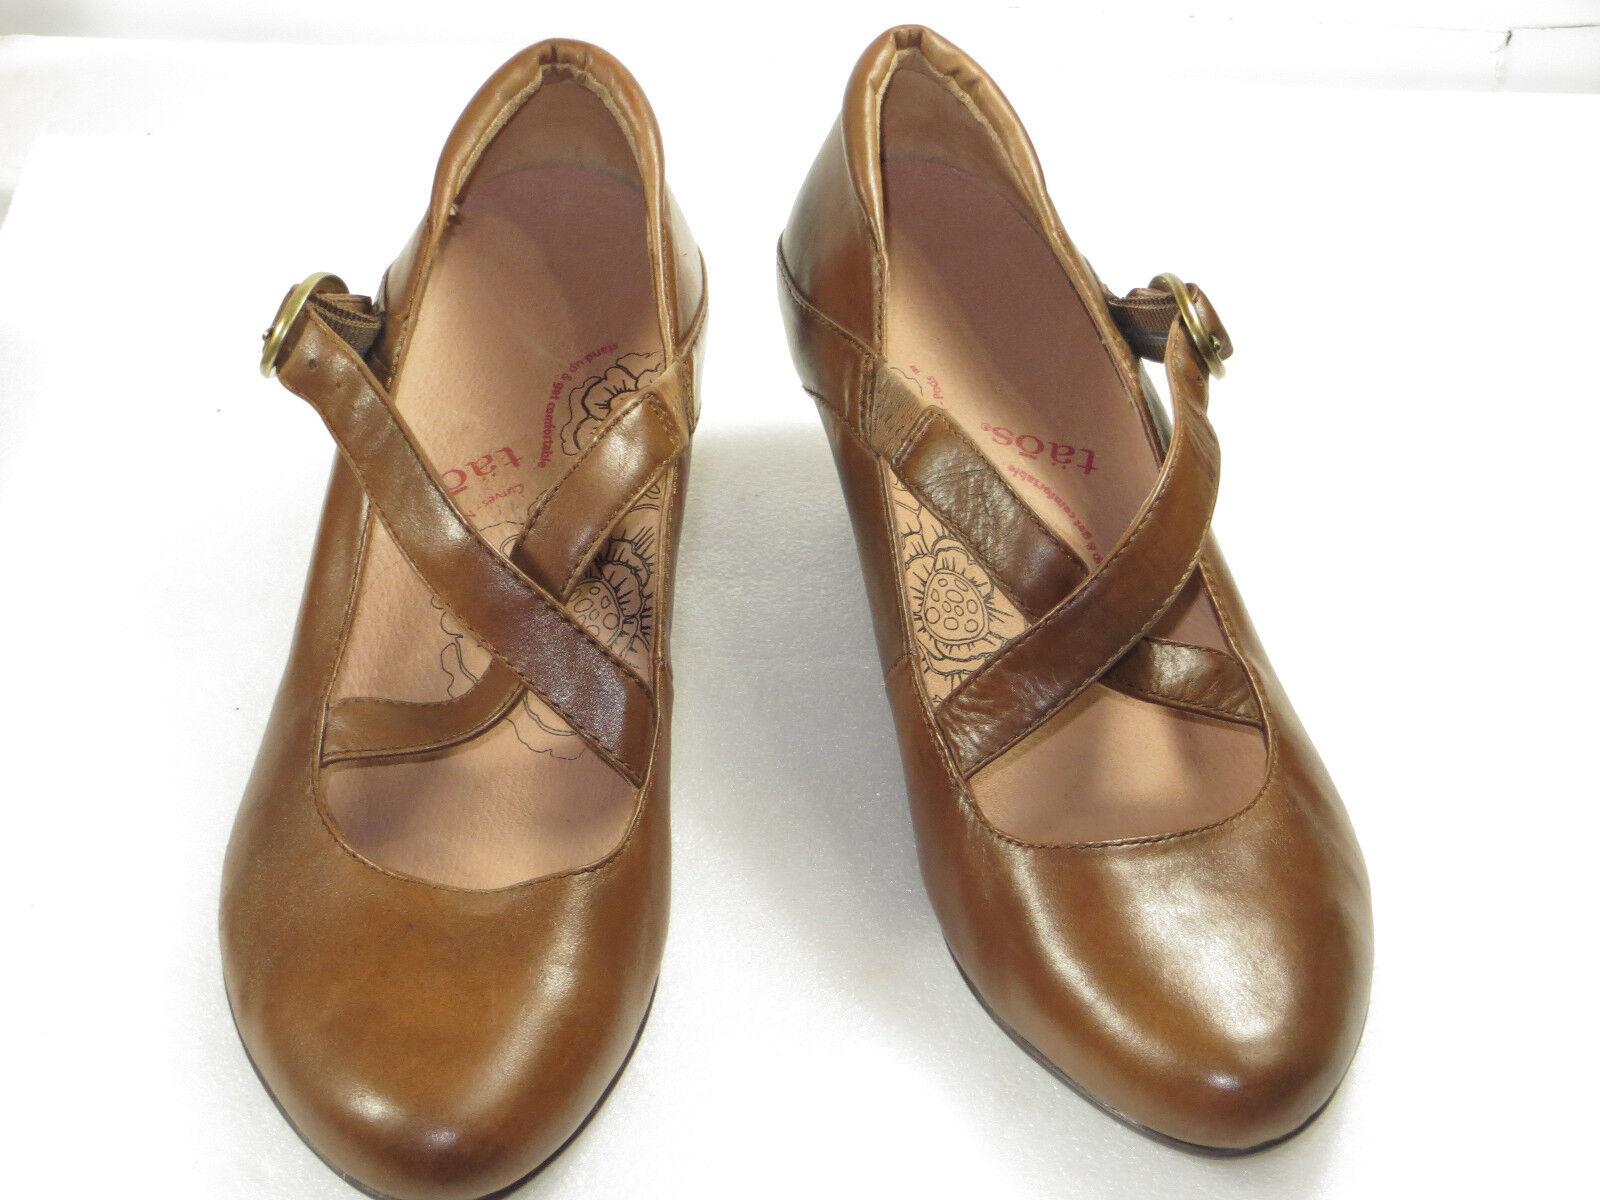 GR8  Womens TAOS block Heels mary janes cross leather,comfy,walk,9 M Pumps  145